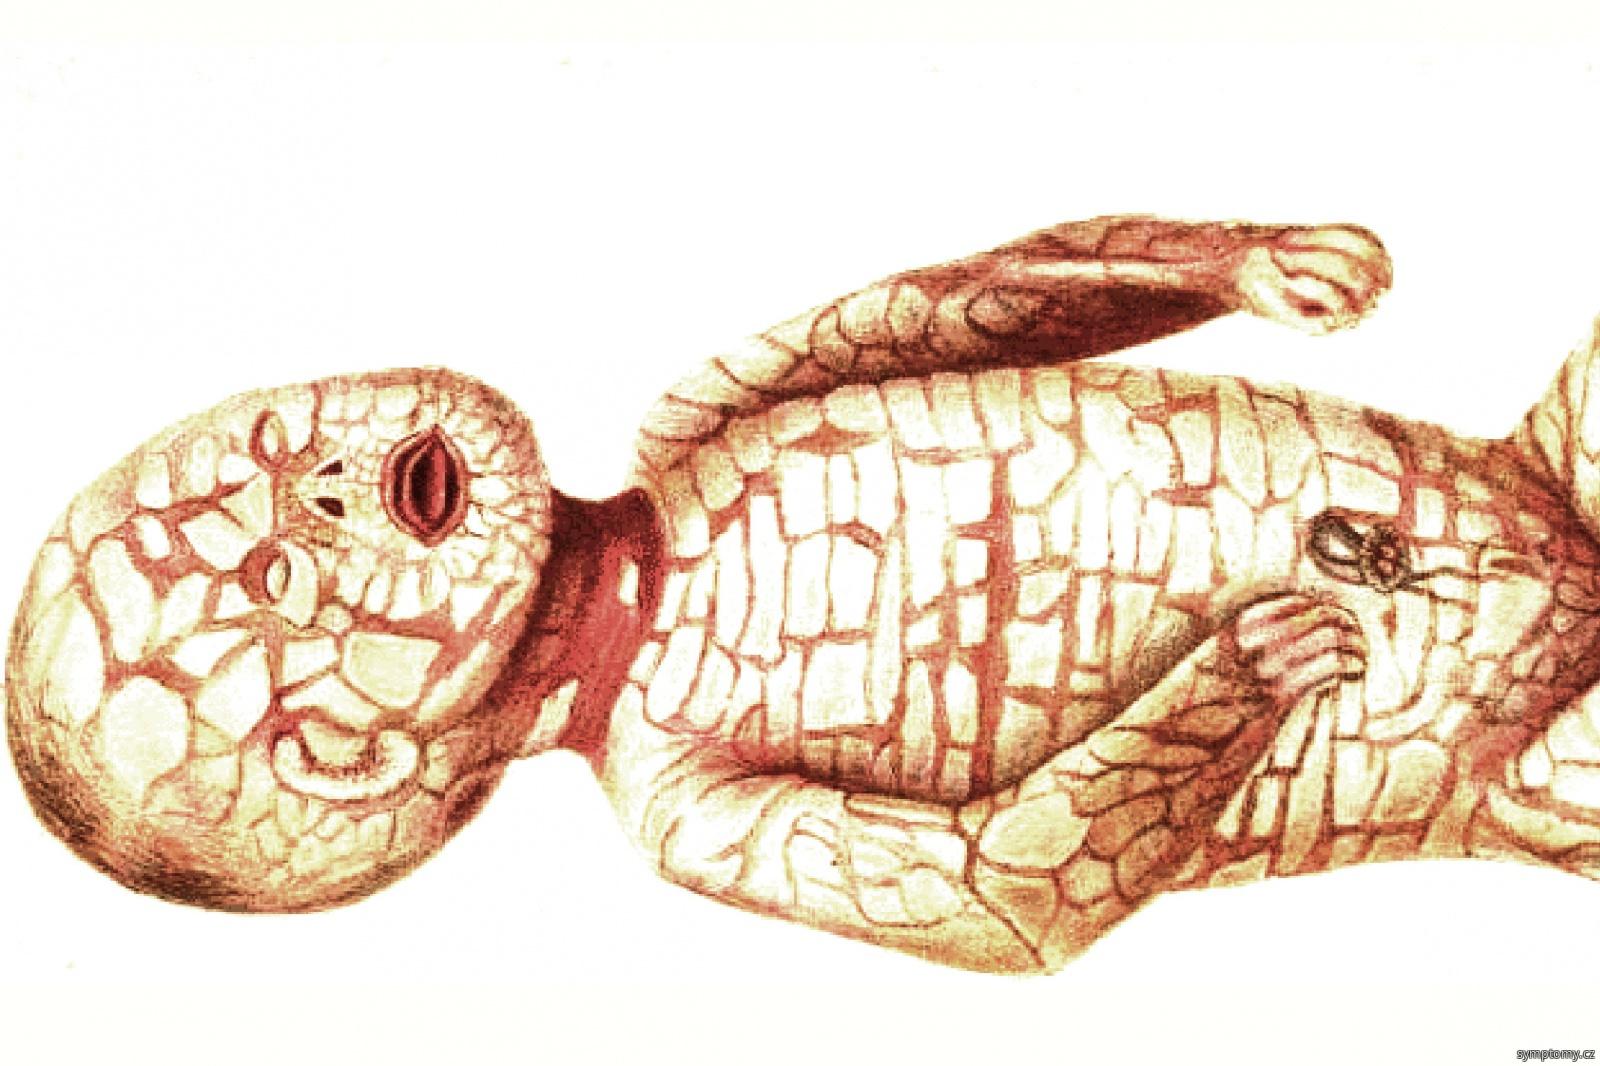 Harlequin Ichthyosis